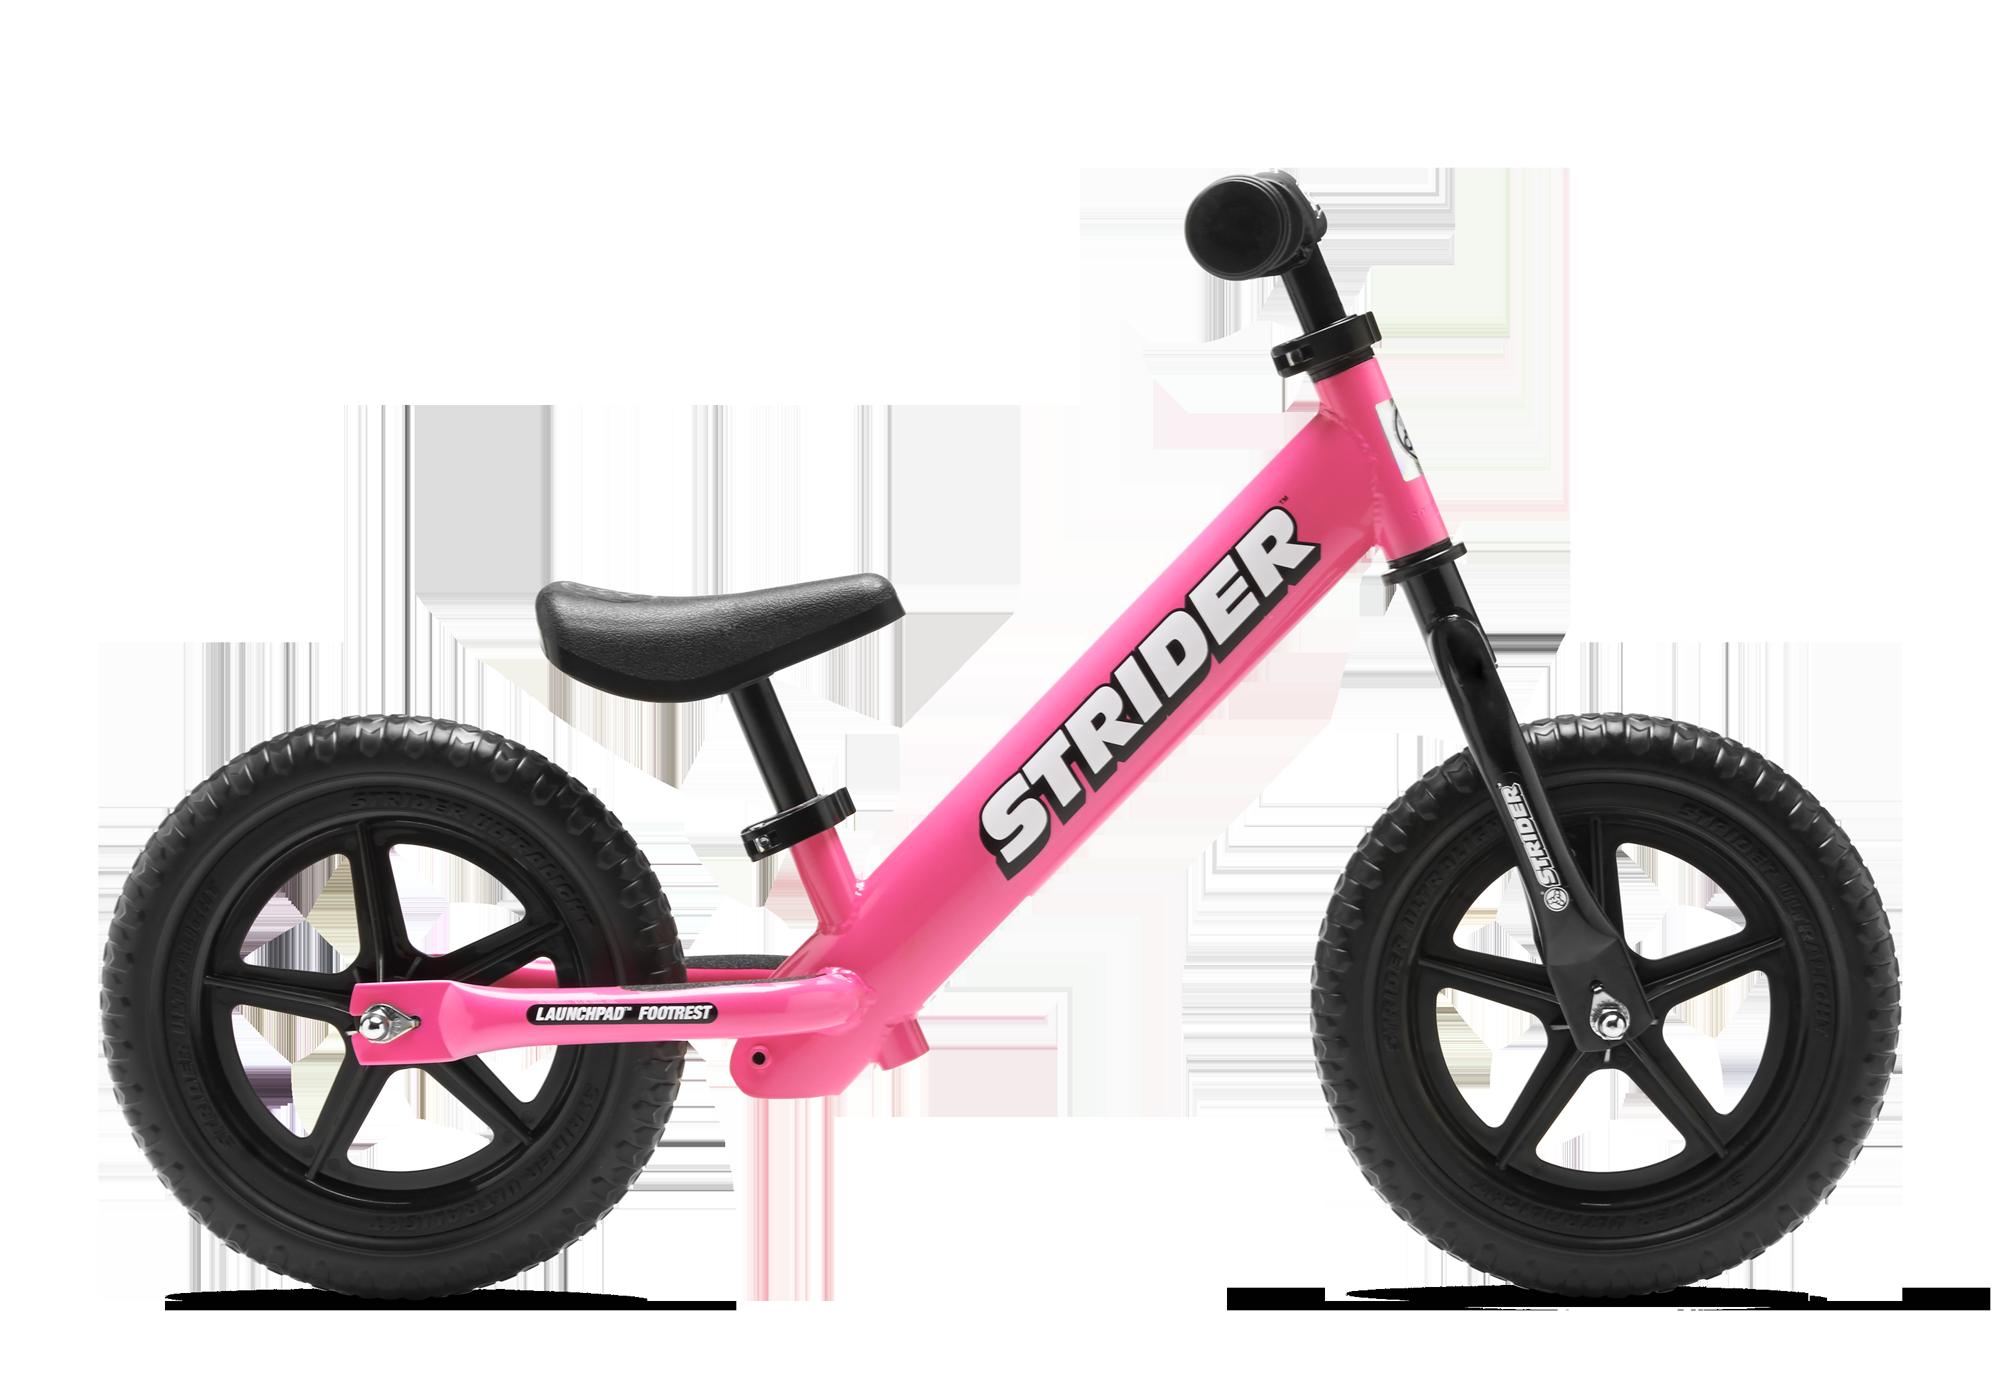 Clipart bike pink. Fabricaciop push